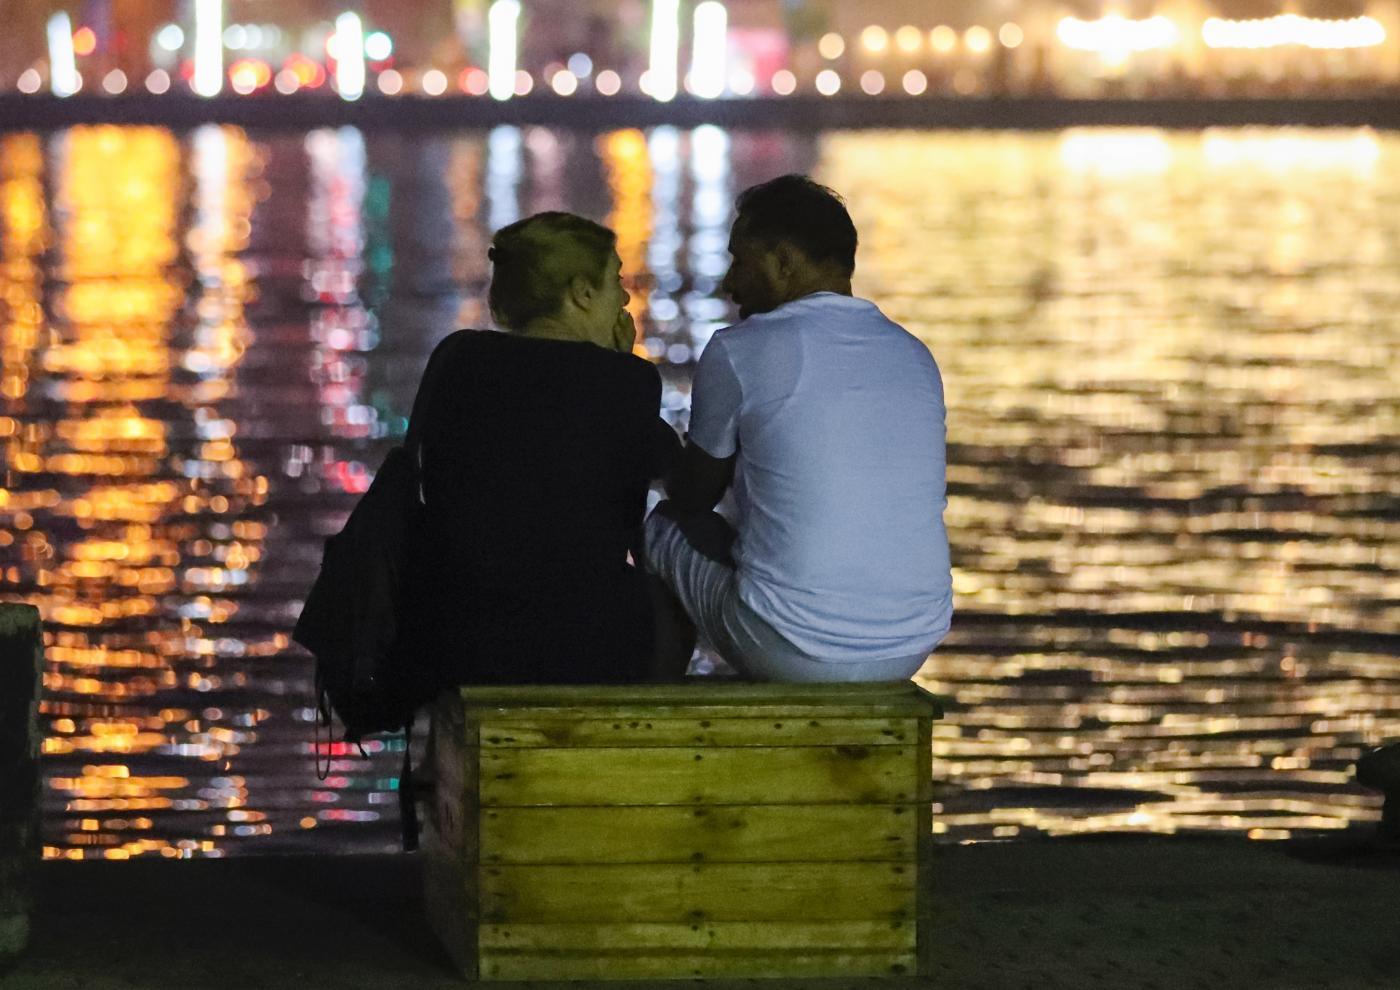 Dubai suspends marriage and divorce filings to curb spread of Coronavirus lindaikejisblog